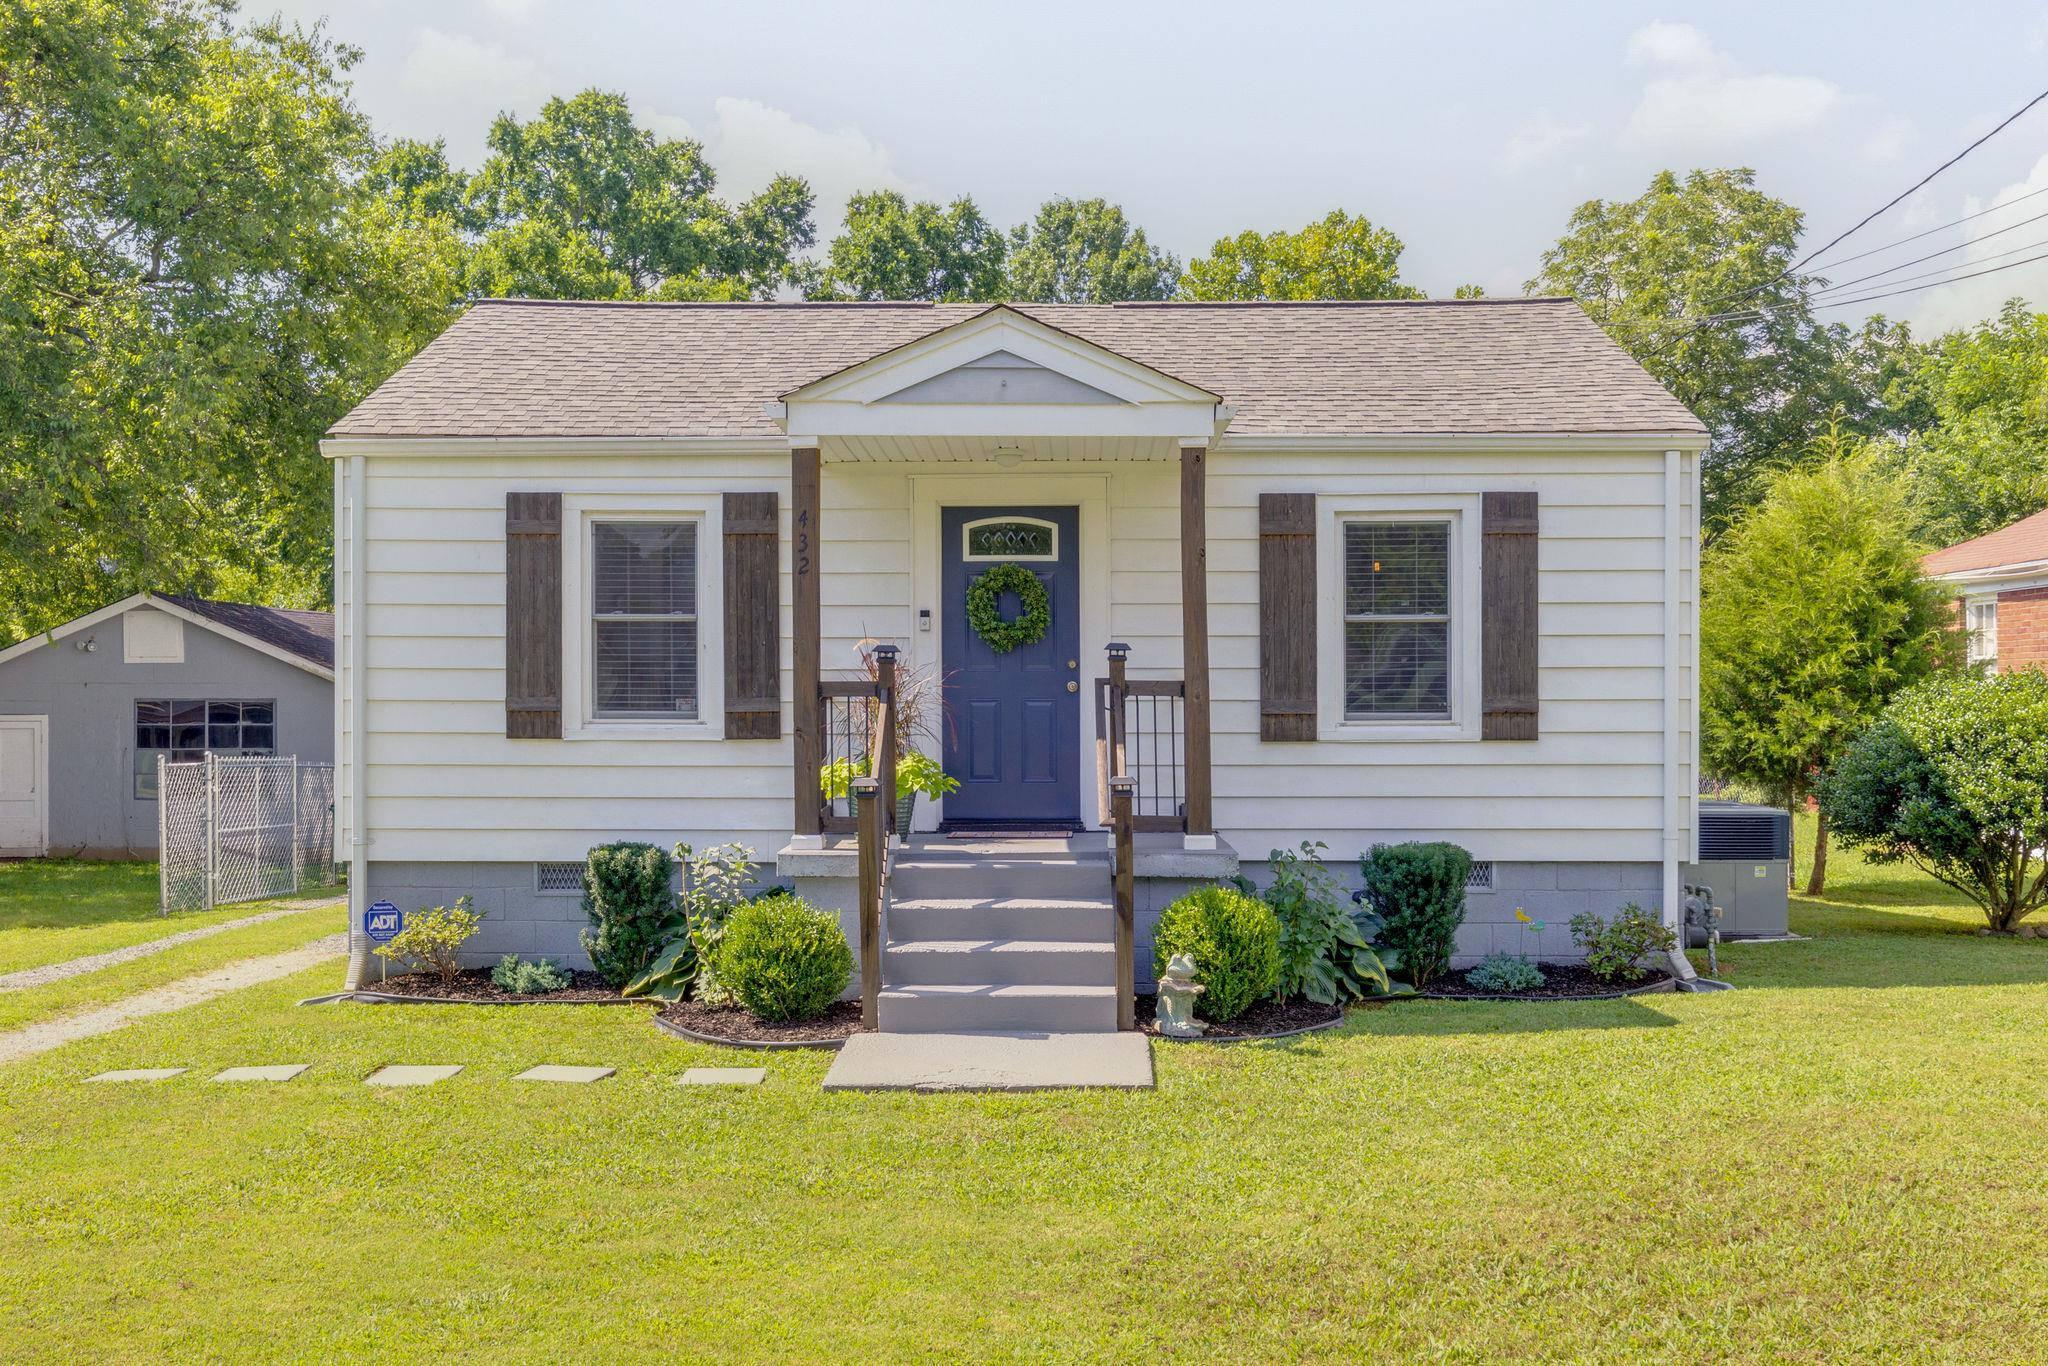 432 Emmitt Ave, Madison, TN 37115 - Madison, TN real estate listing